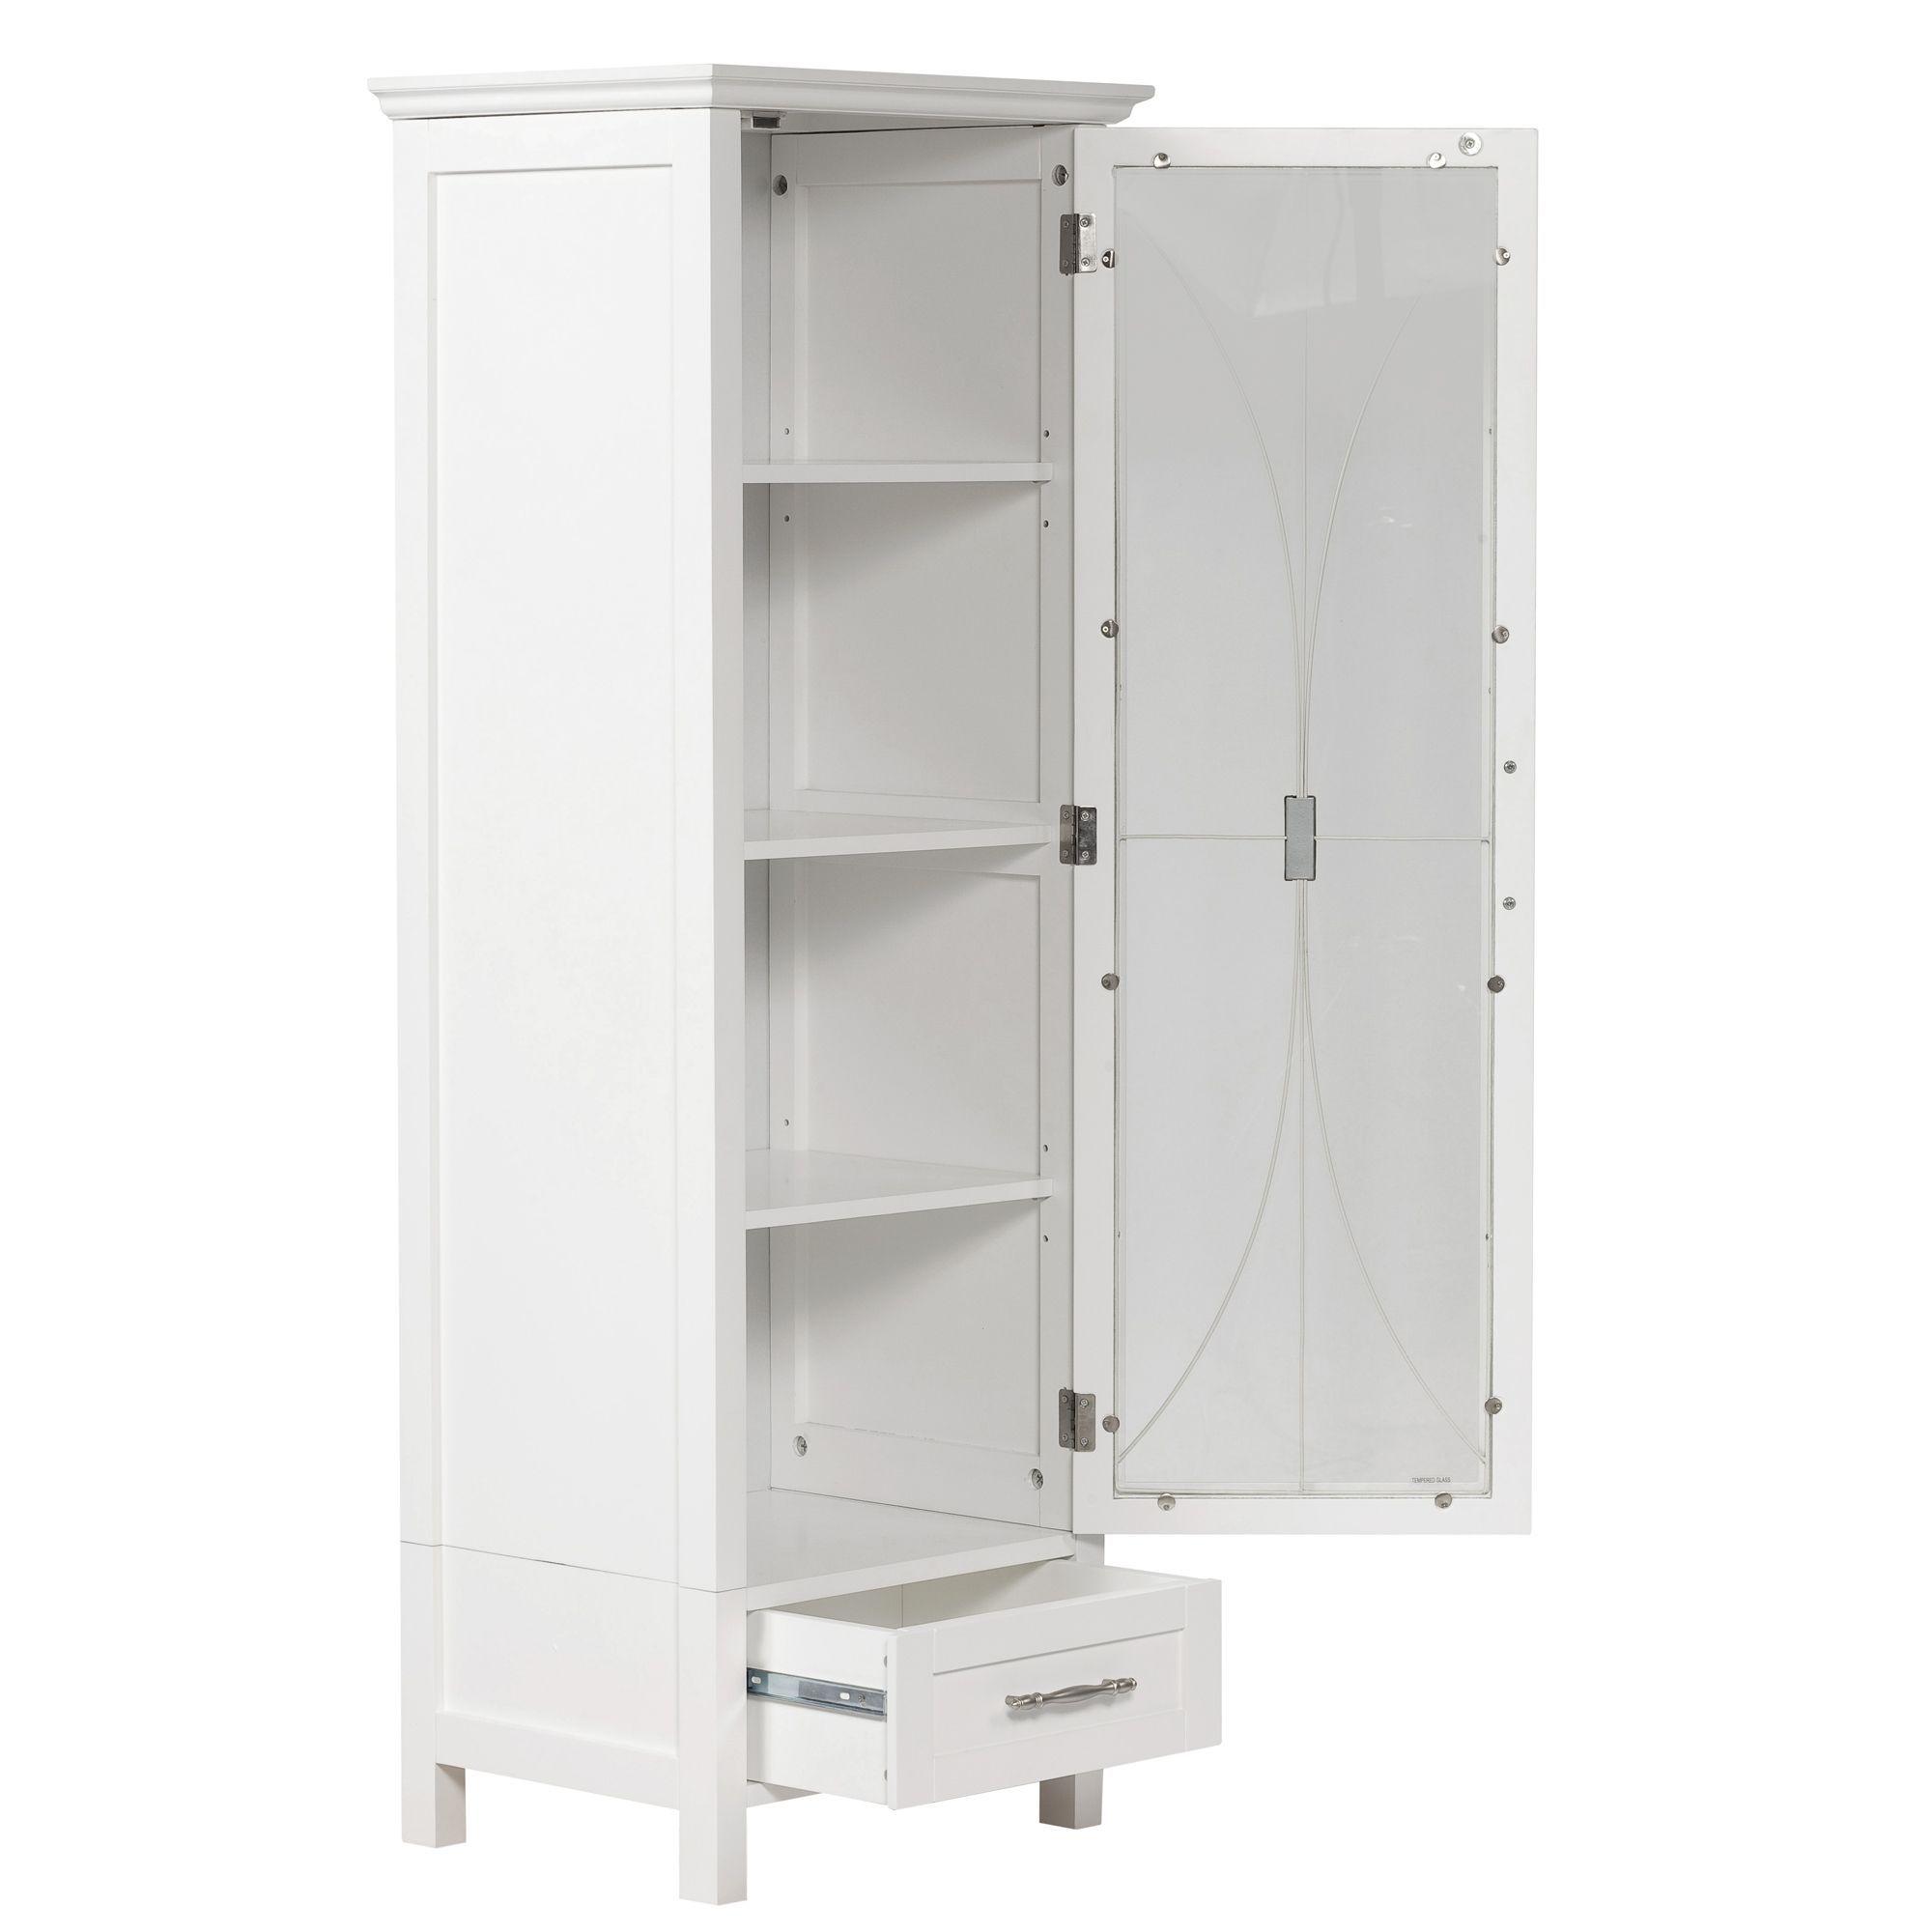 white floor standing bathroom storage cabinet unit | Stribal.com ...